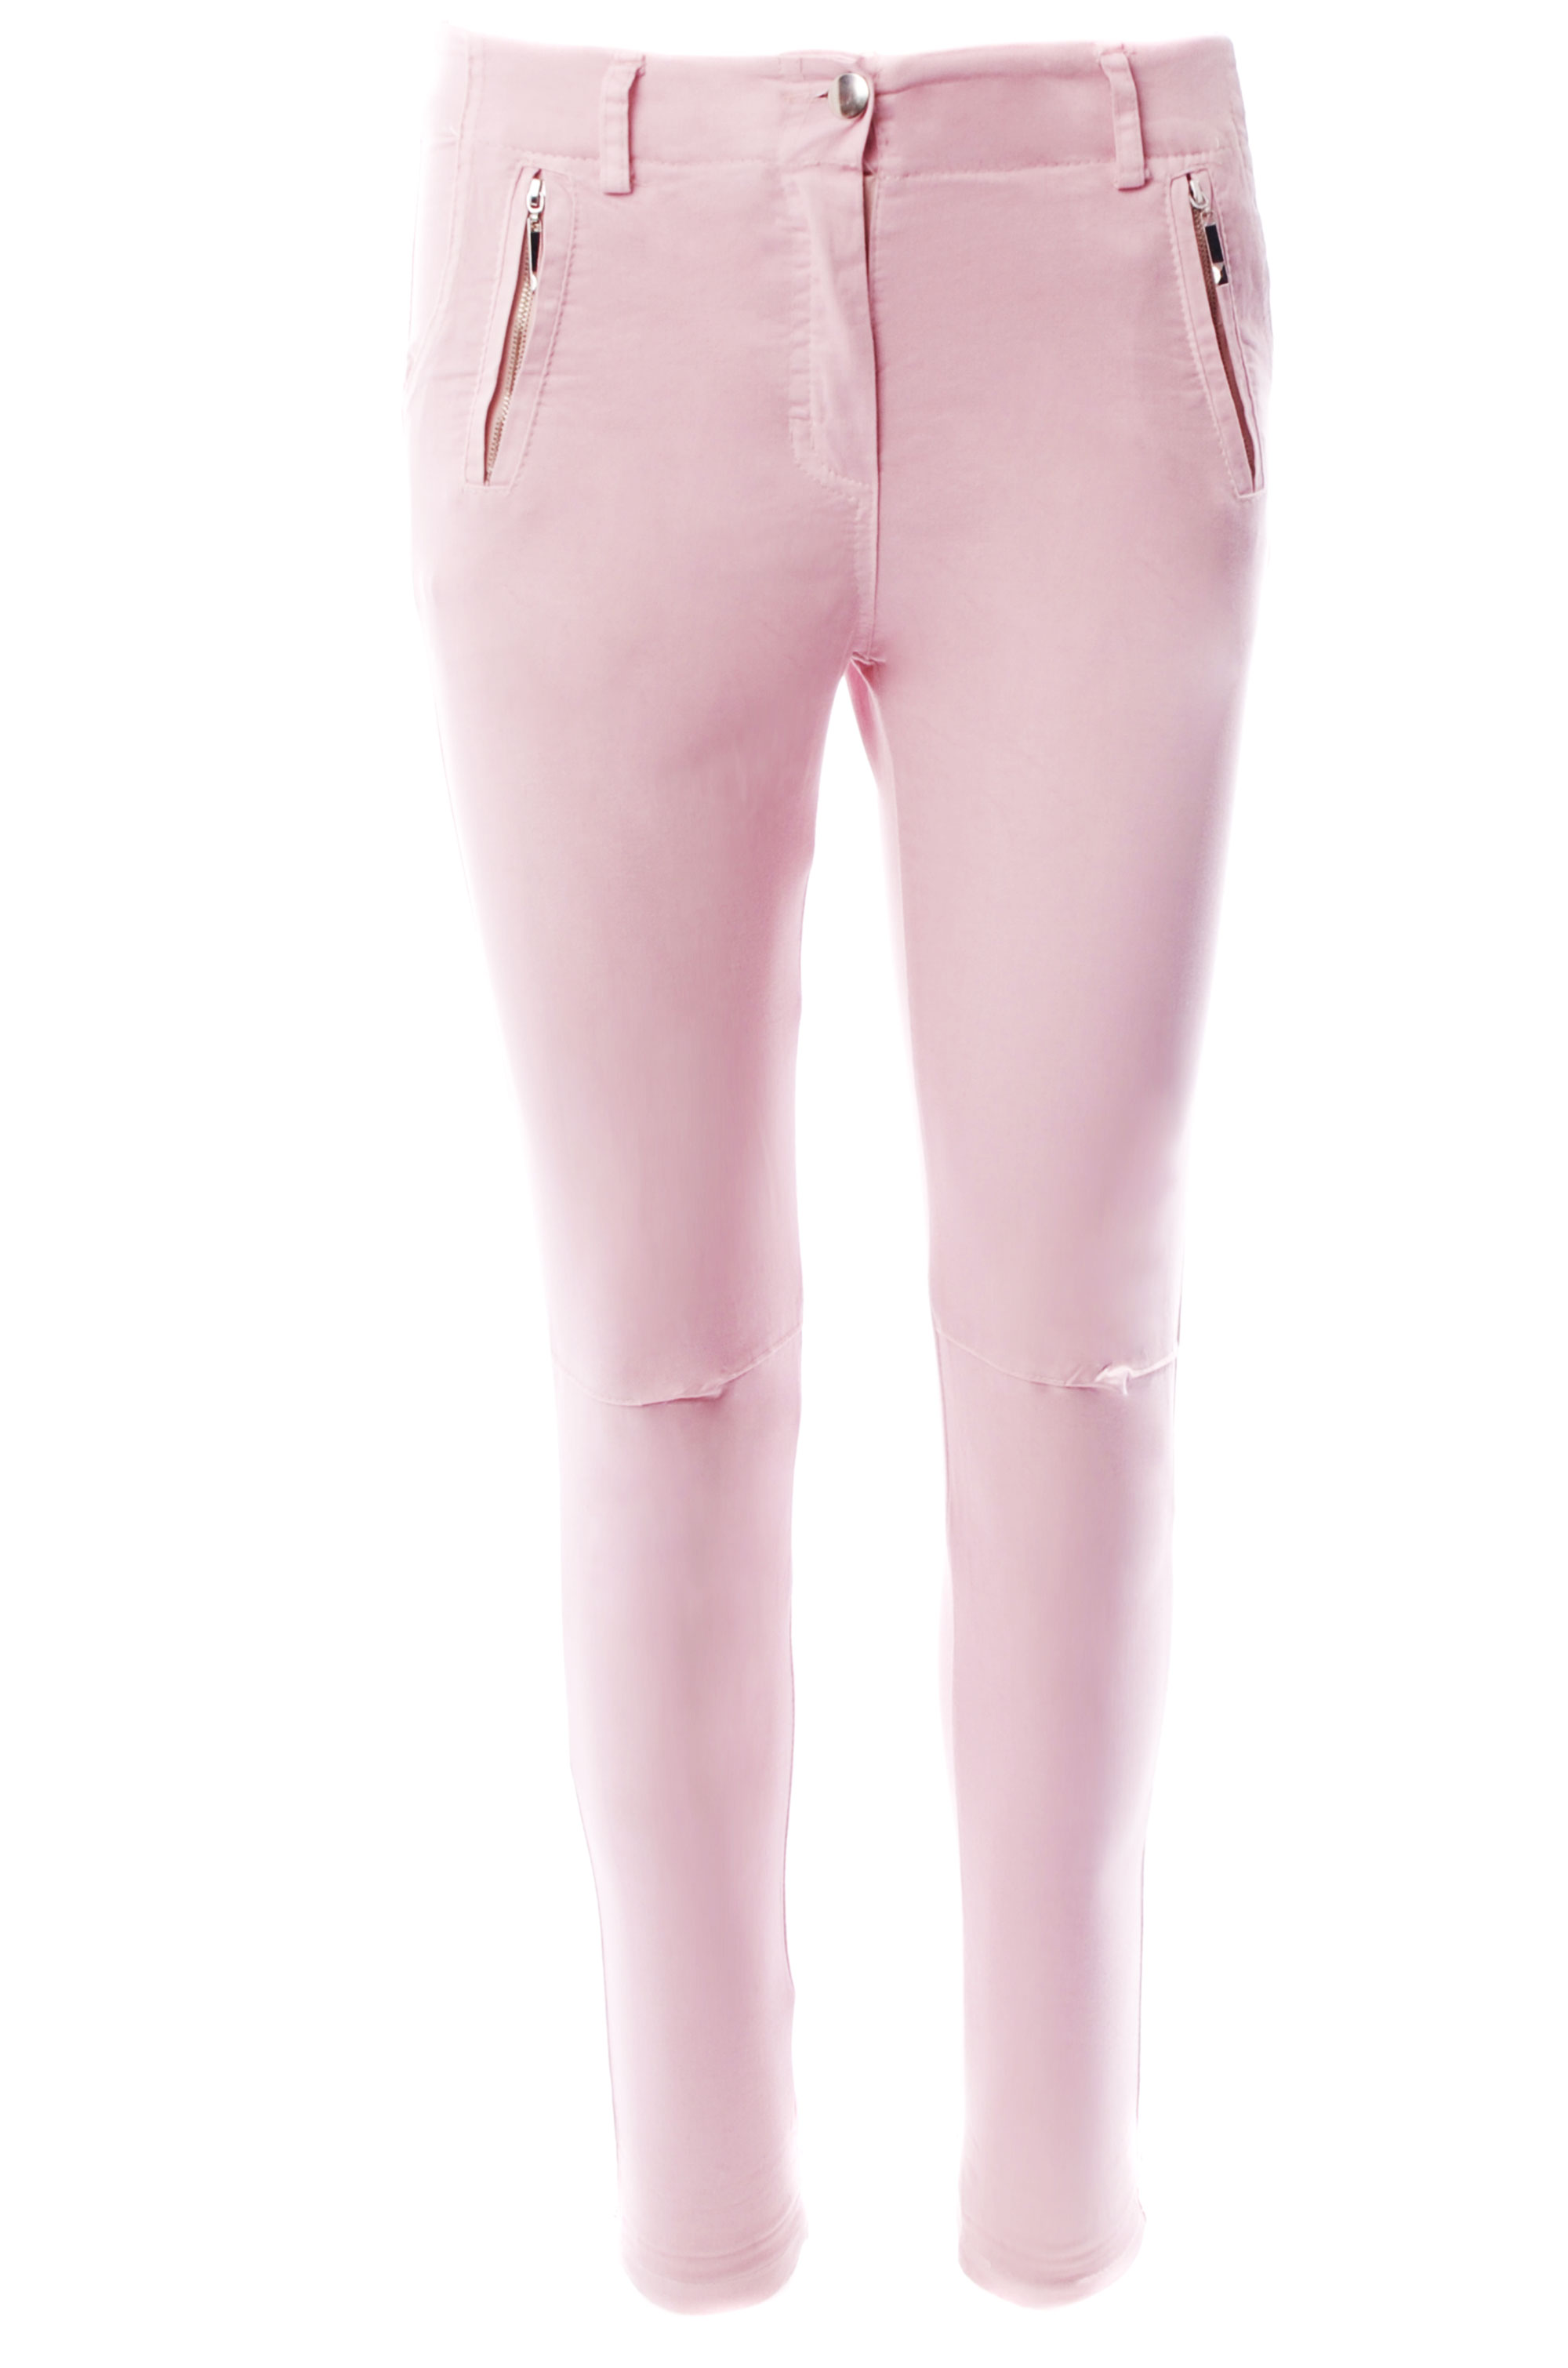 Spodnie - 10-2892 ROSA - Unisono